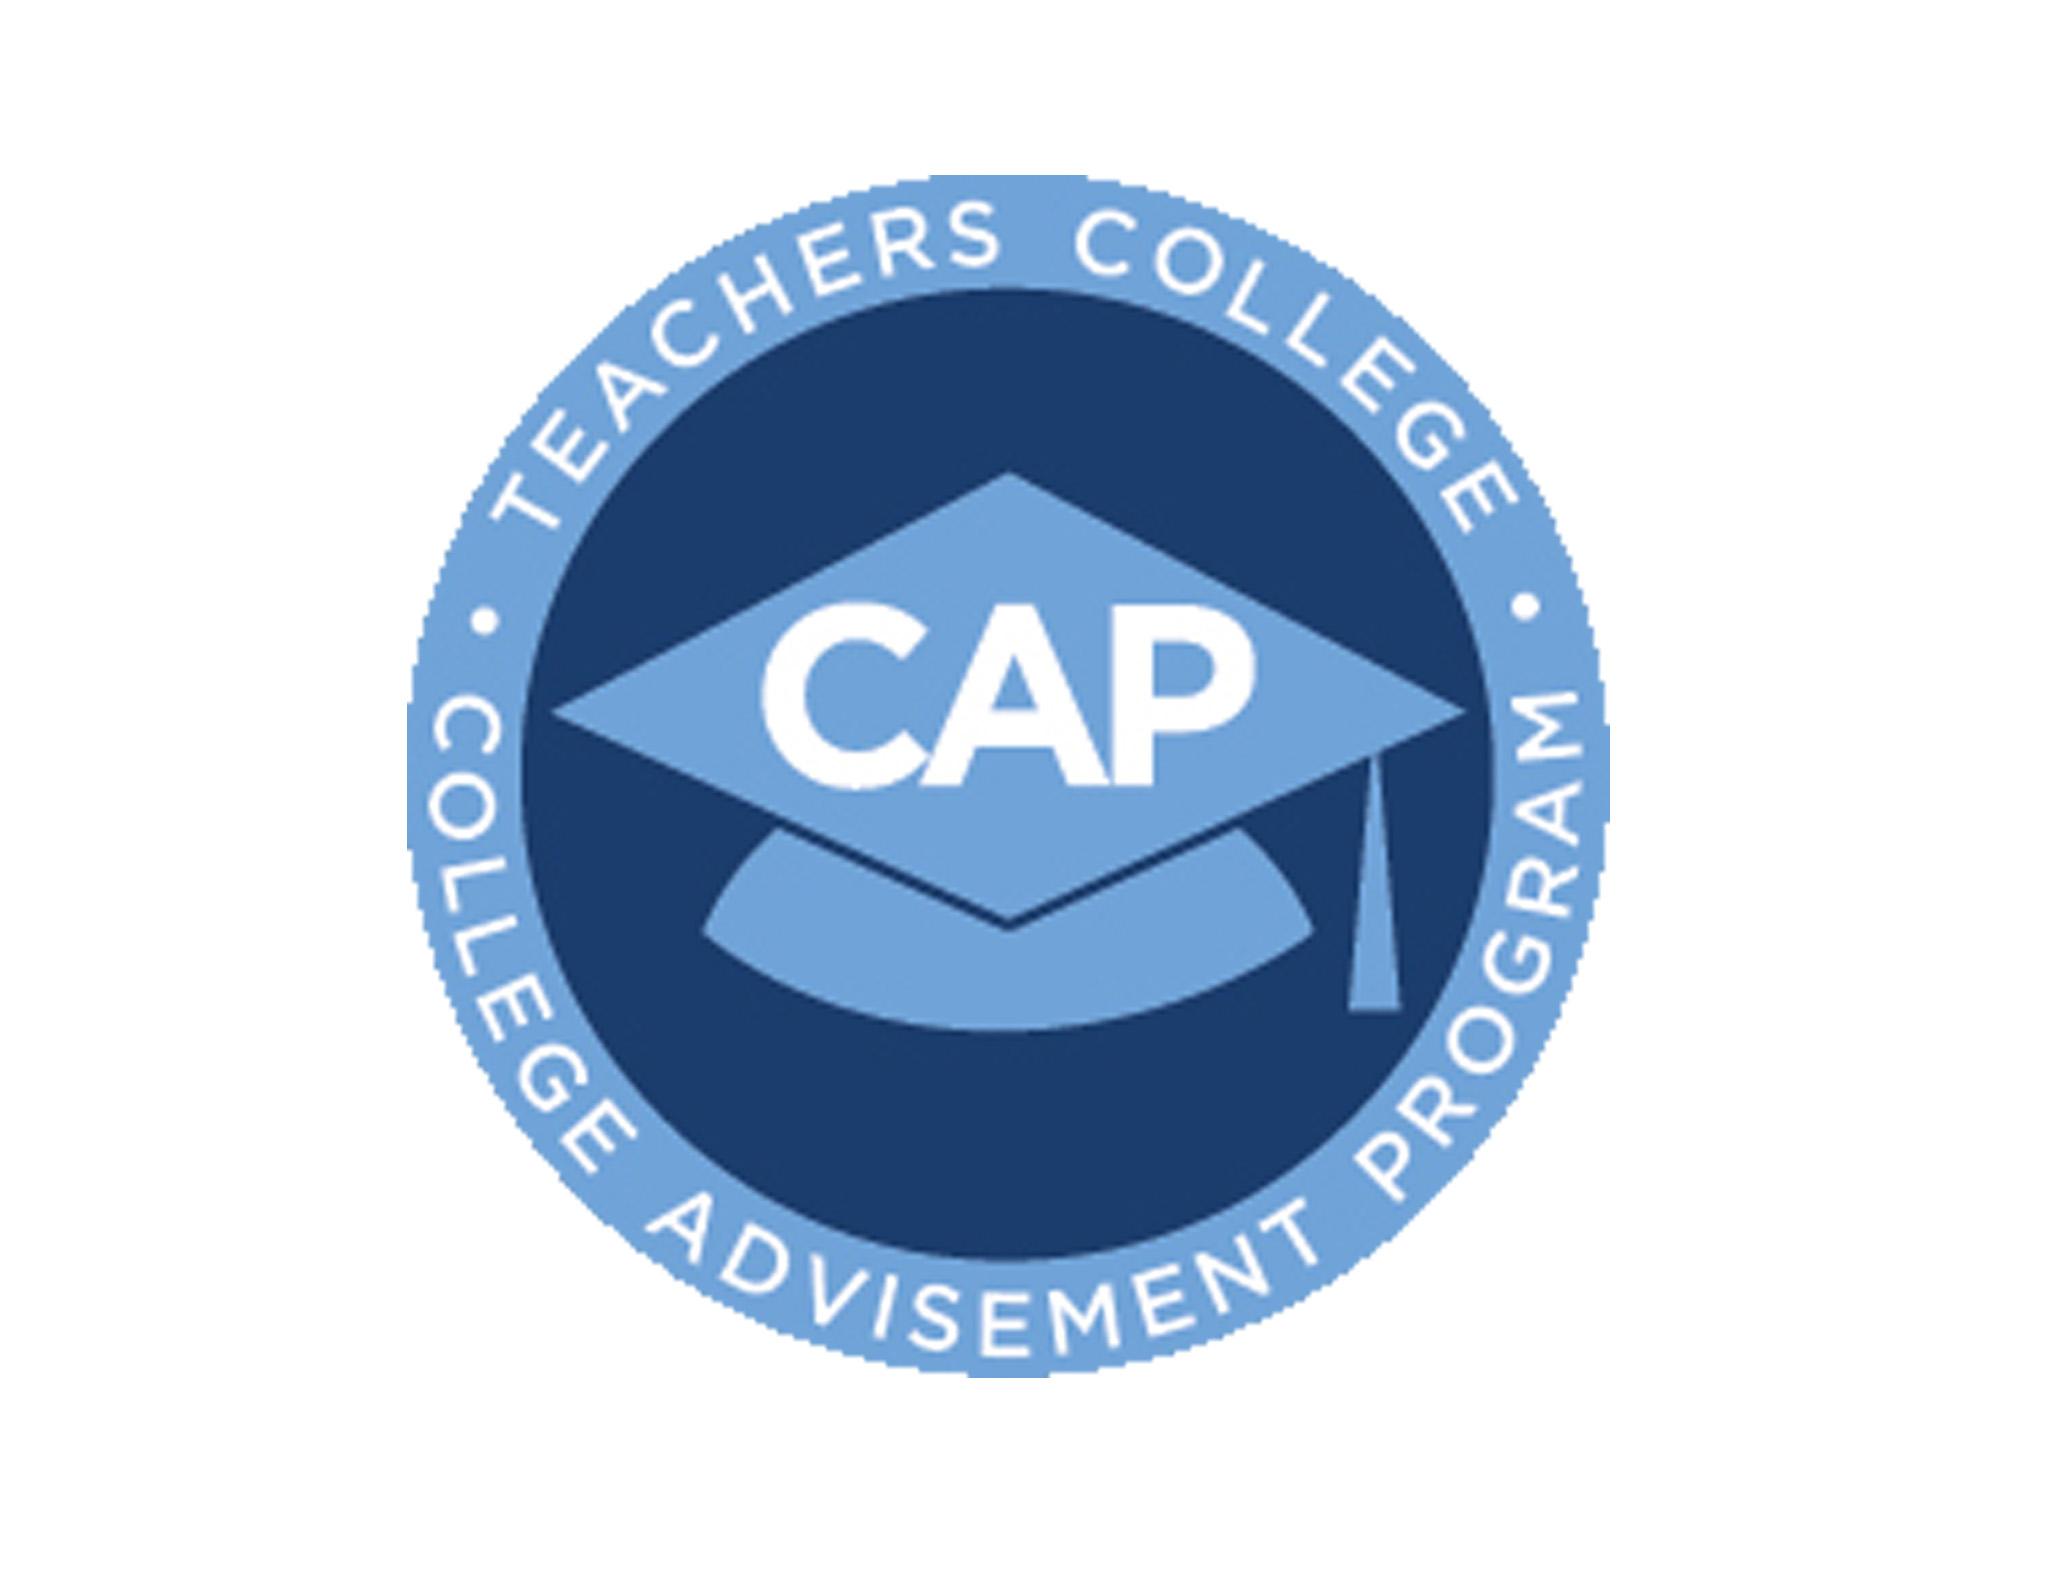 c091dfc4ef2 Programs - Teachers College